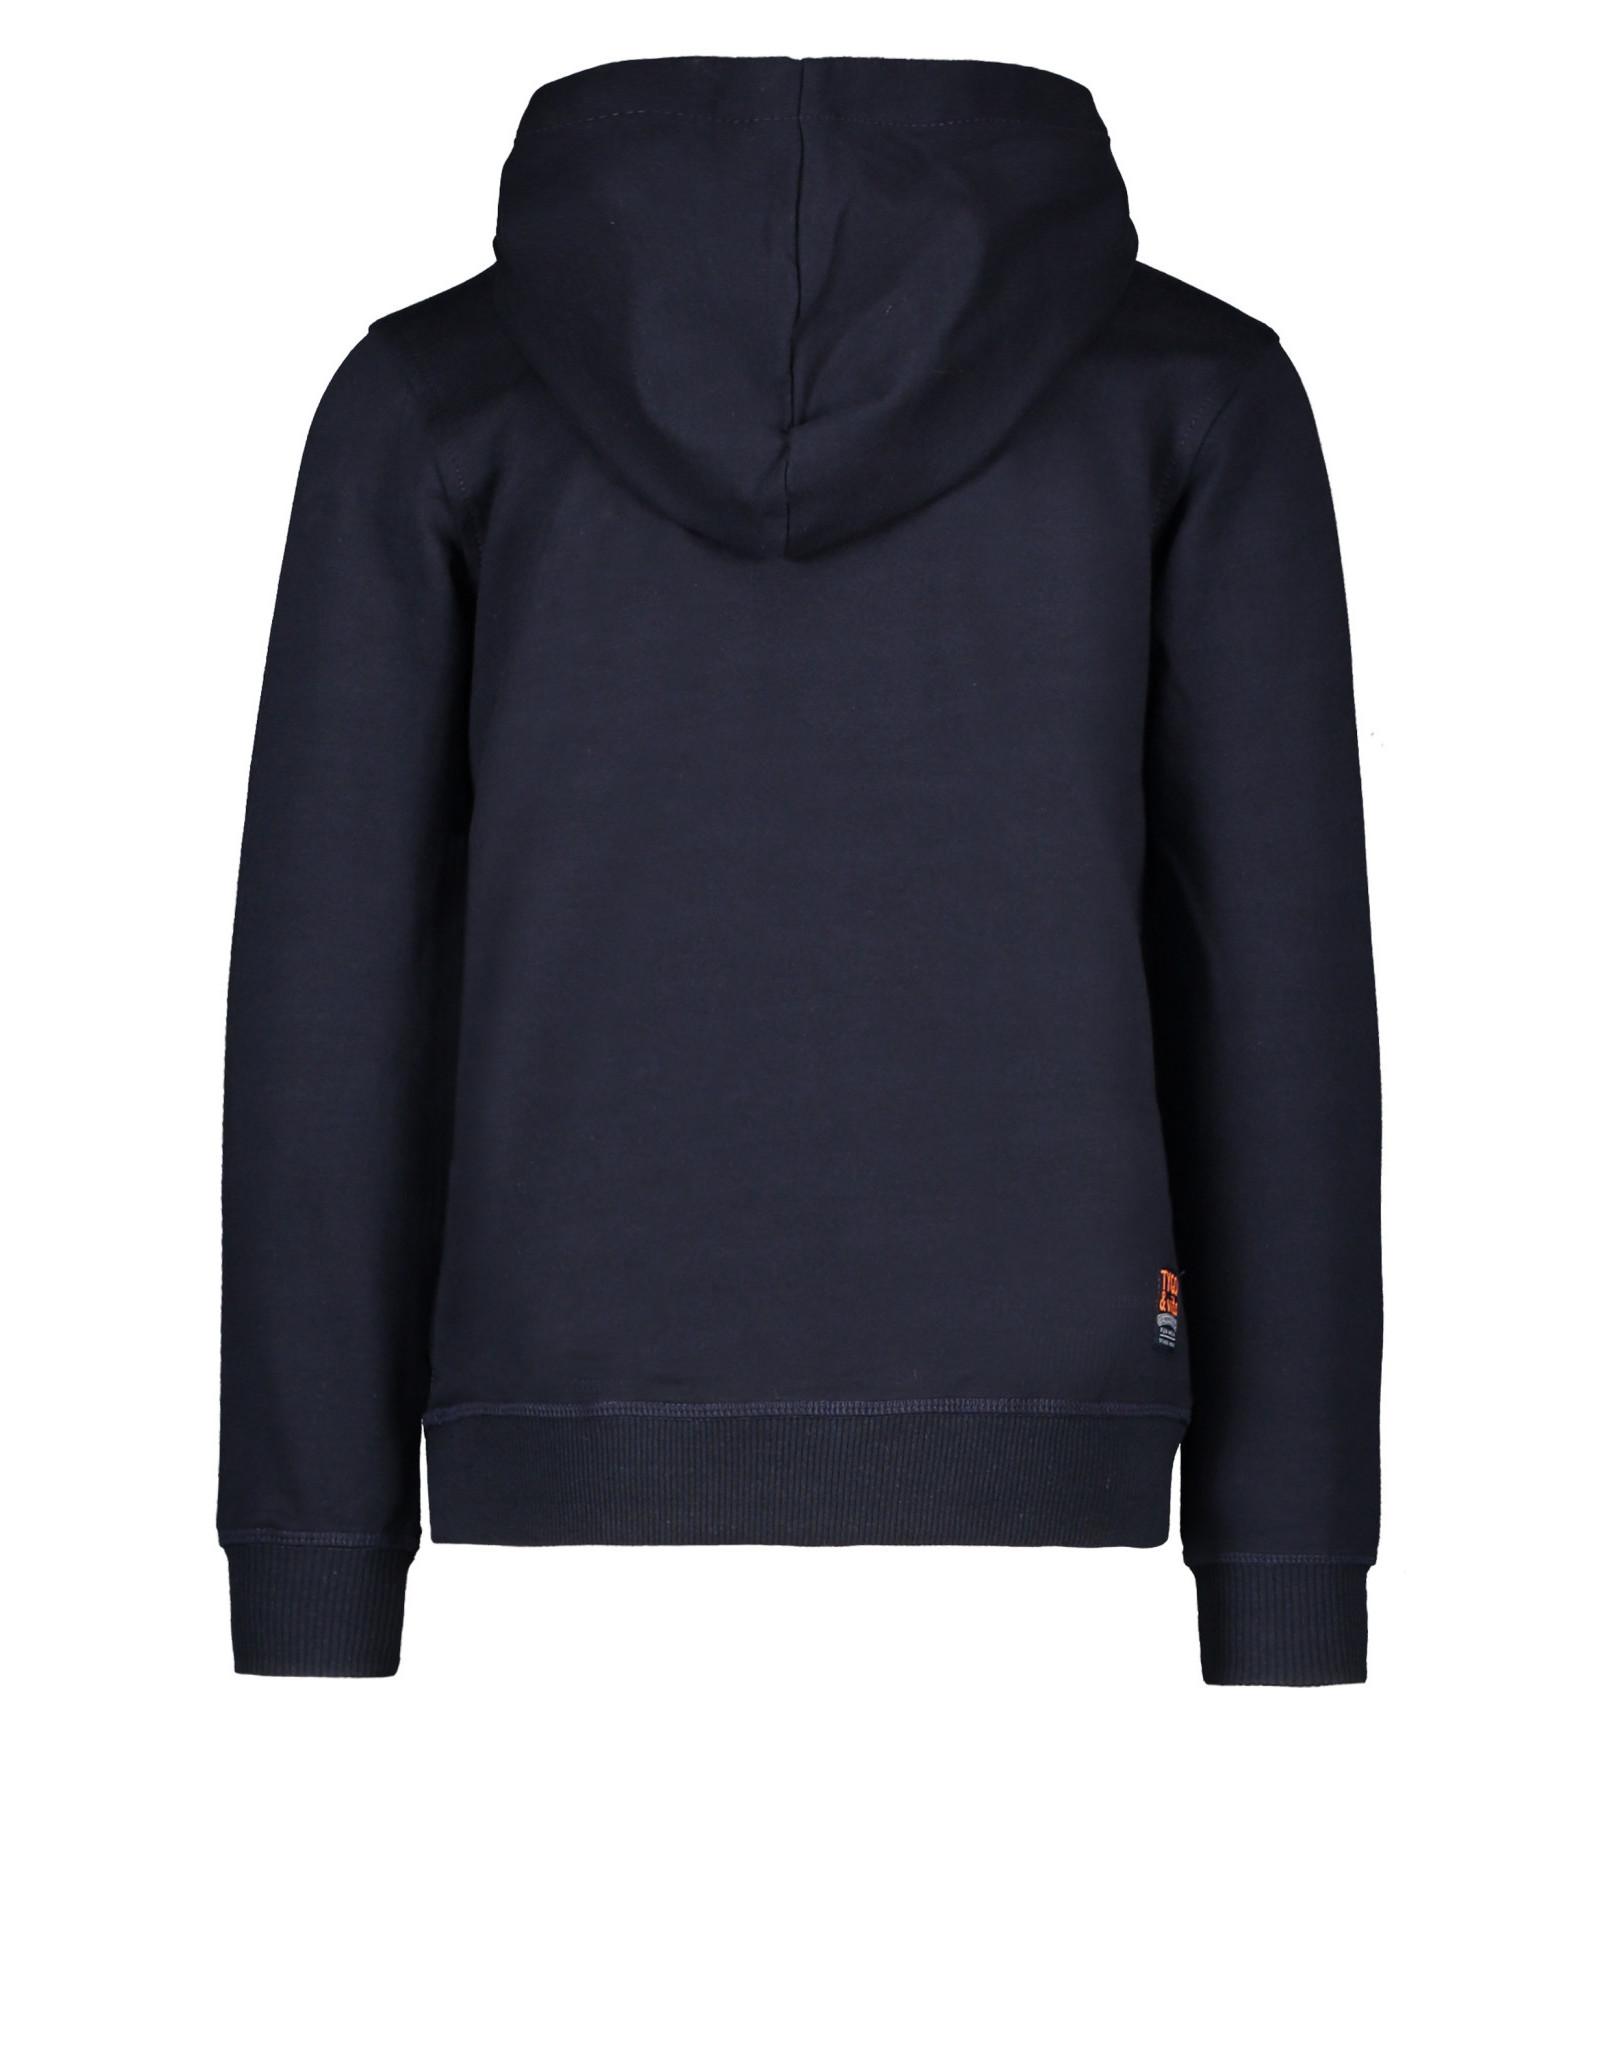 TYGO&vito hoodie